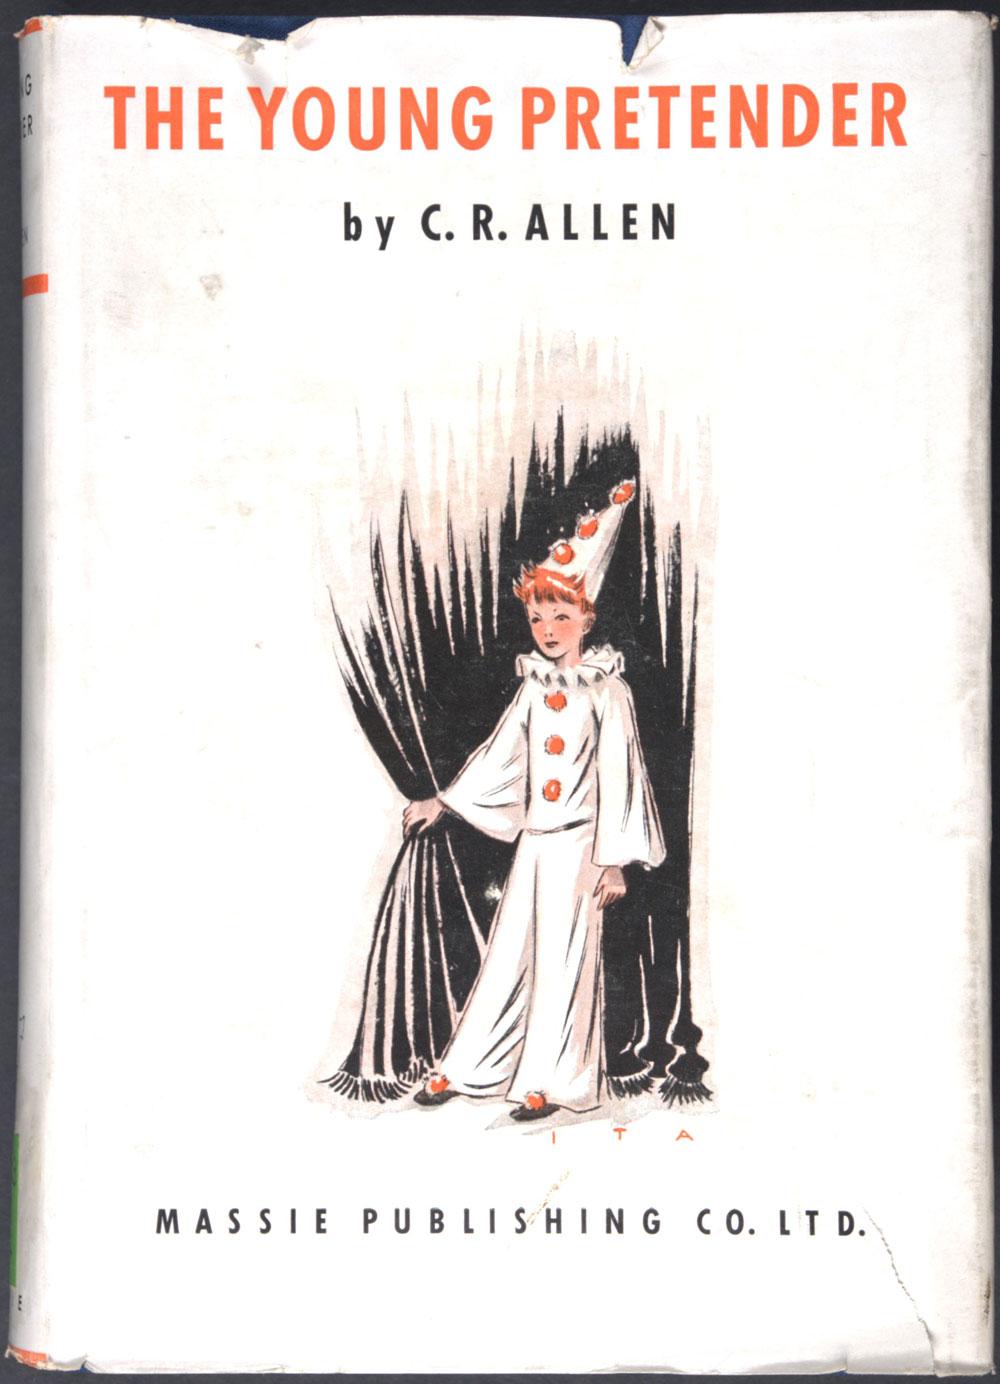 C.R. Allen. <em>The young pretender: a novel.</em> Colonial ed. London: Massie Publishing, 1939.